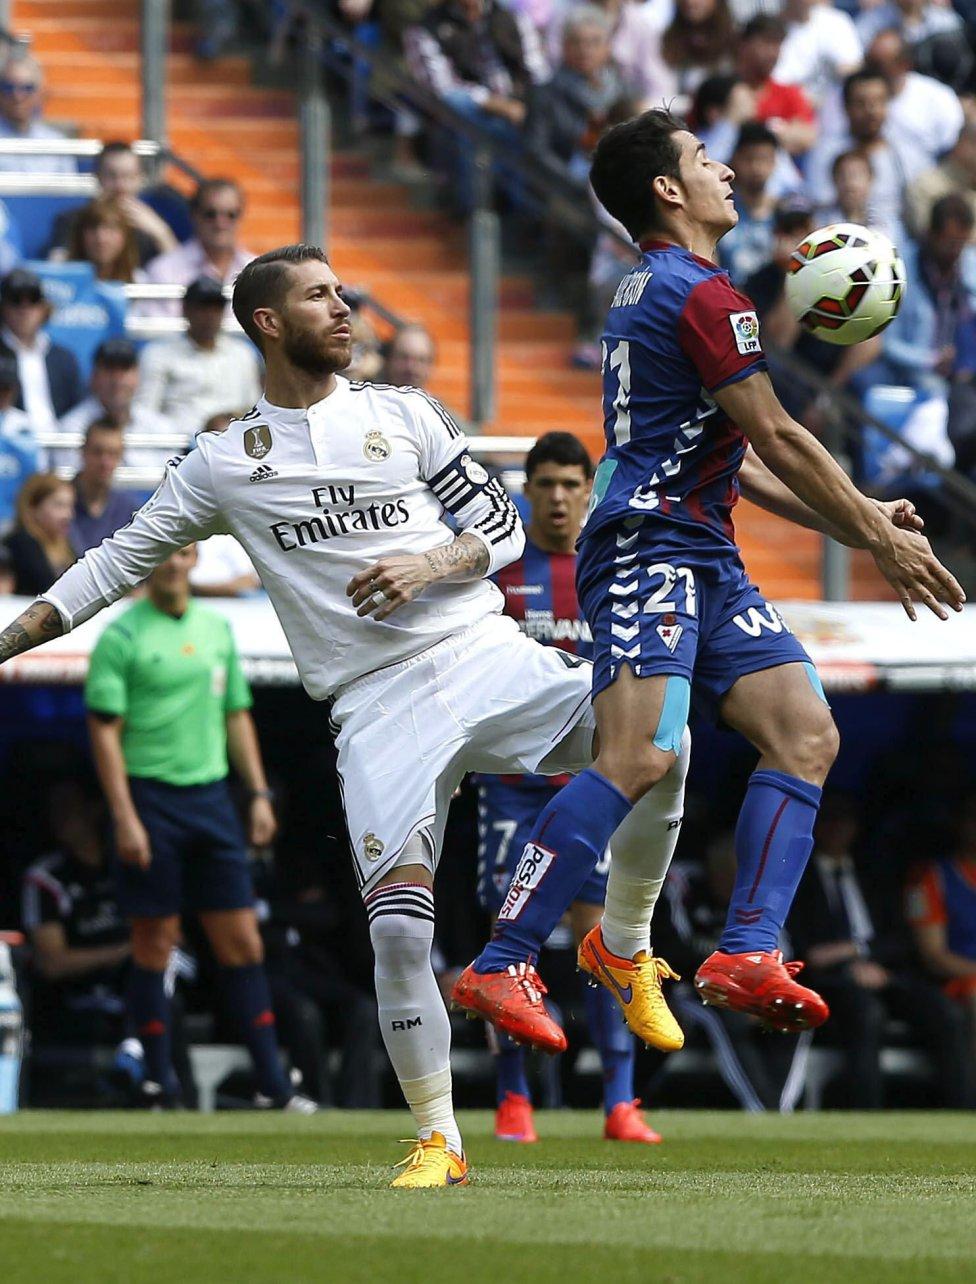 Реал Мадрид - Ейбар